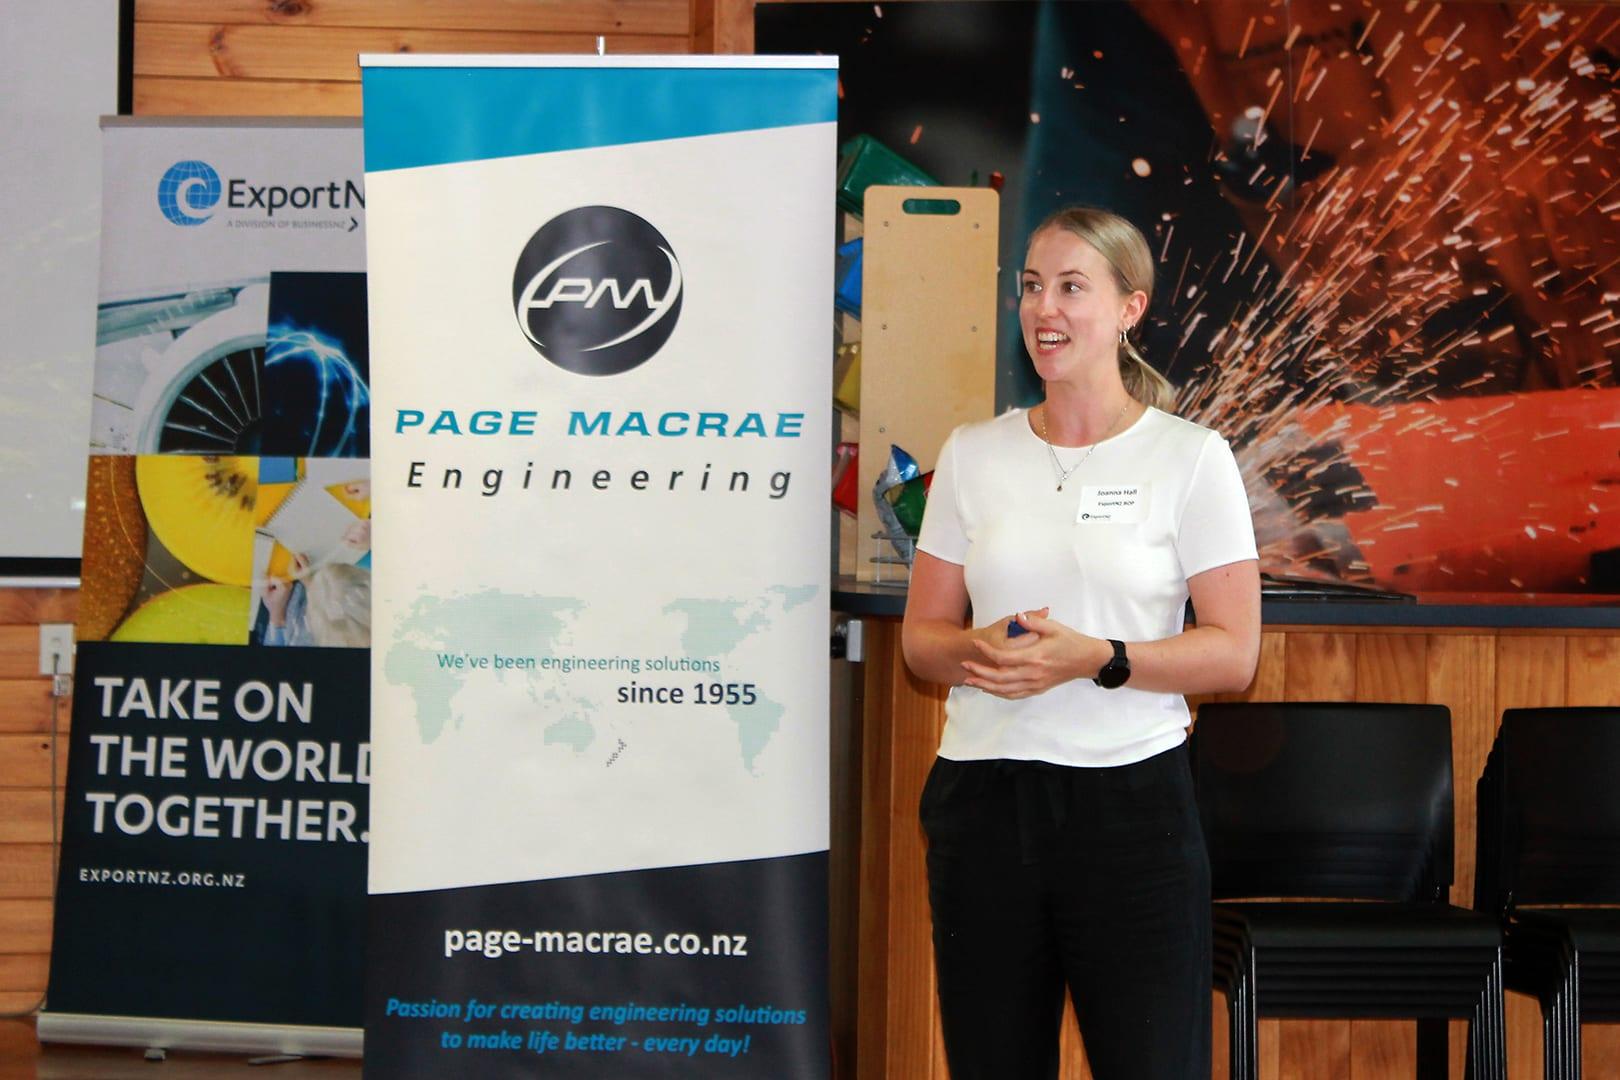 ExportNZ BOP Rub Shoulders with Page Macrae Engineering BA5 event